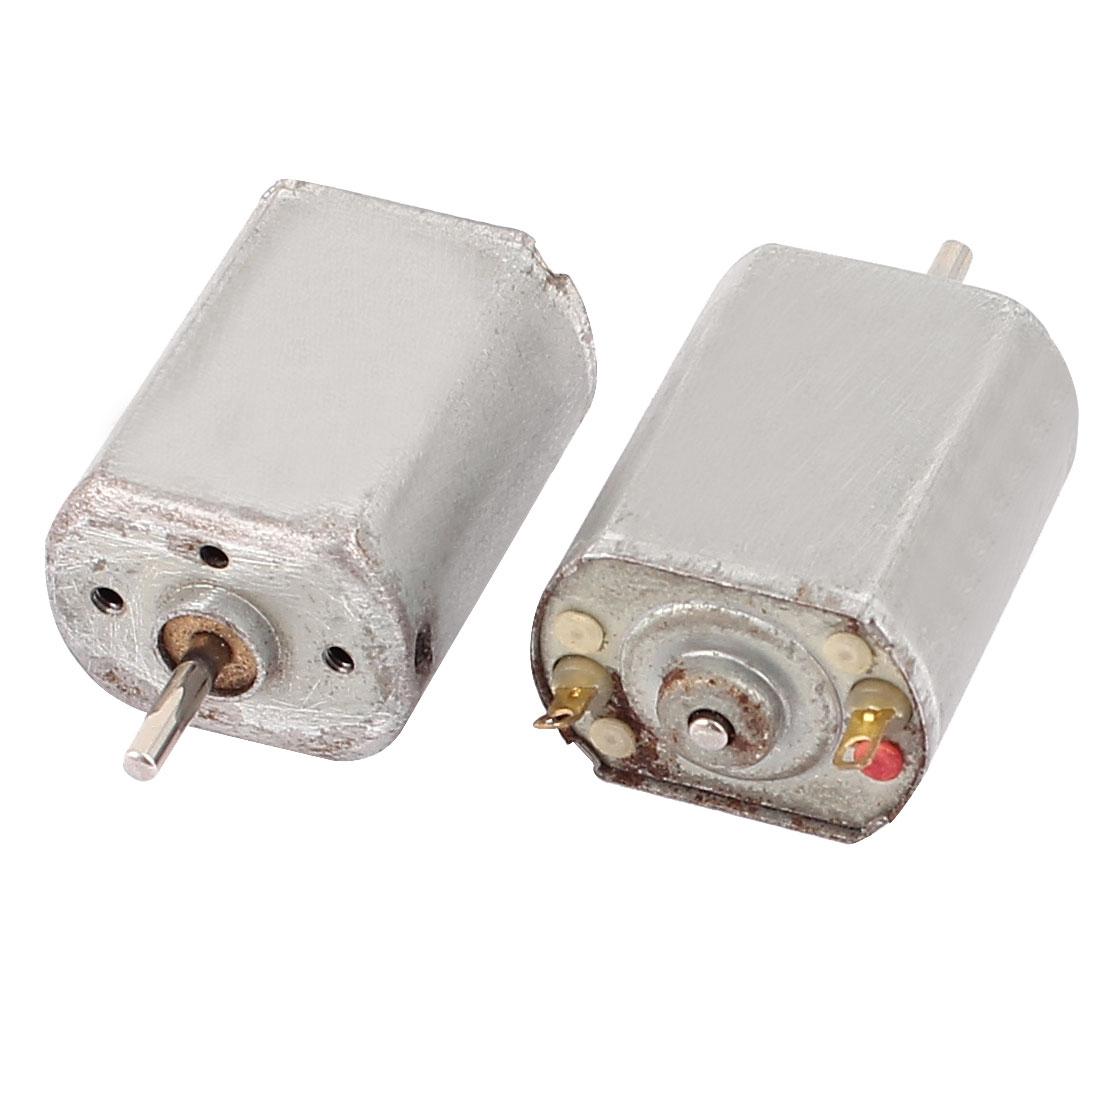 2 Pcs DC 1.5V-4.5V 18000RPM Electric Mini Micro Motor for DIY RC Model Car Ship